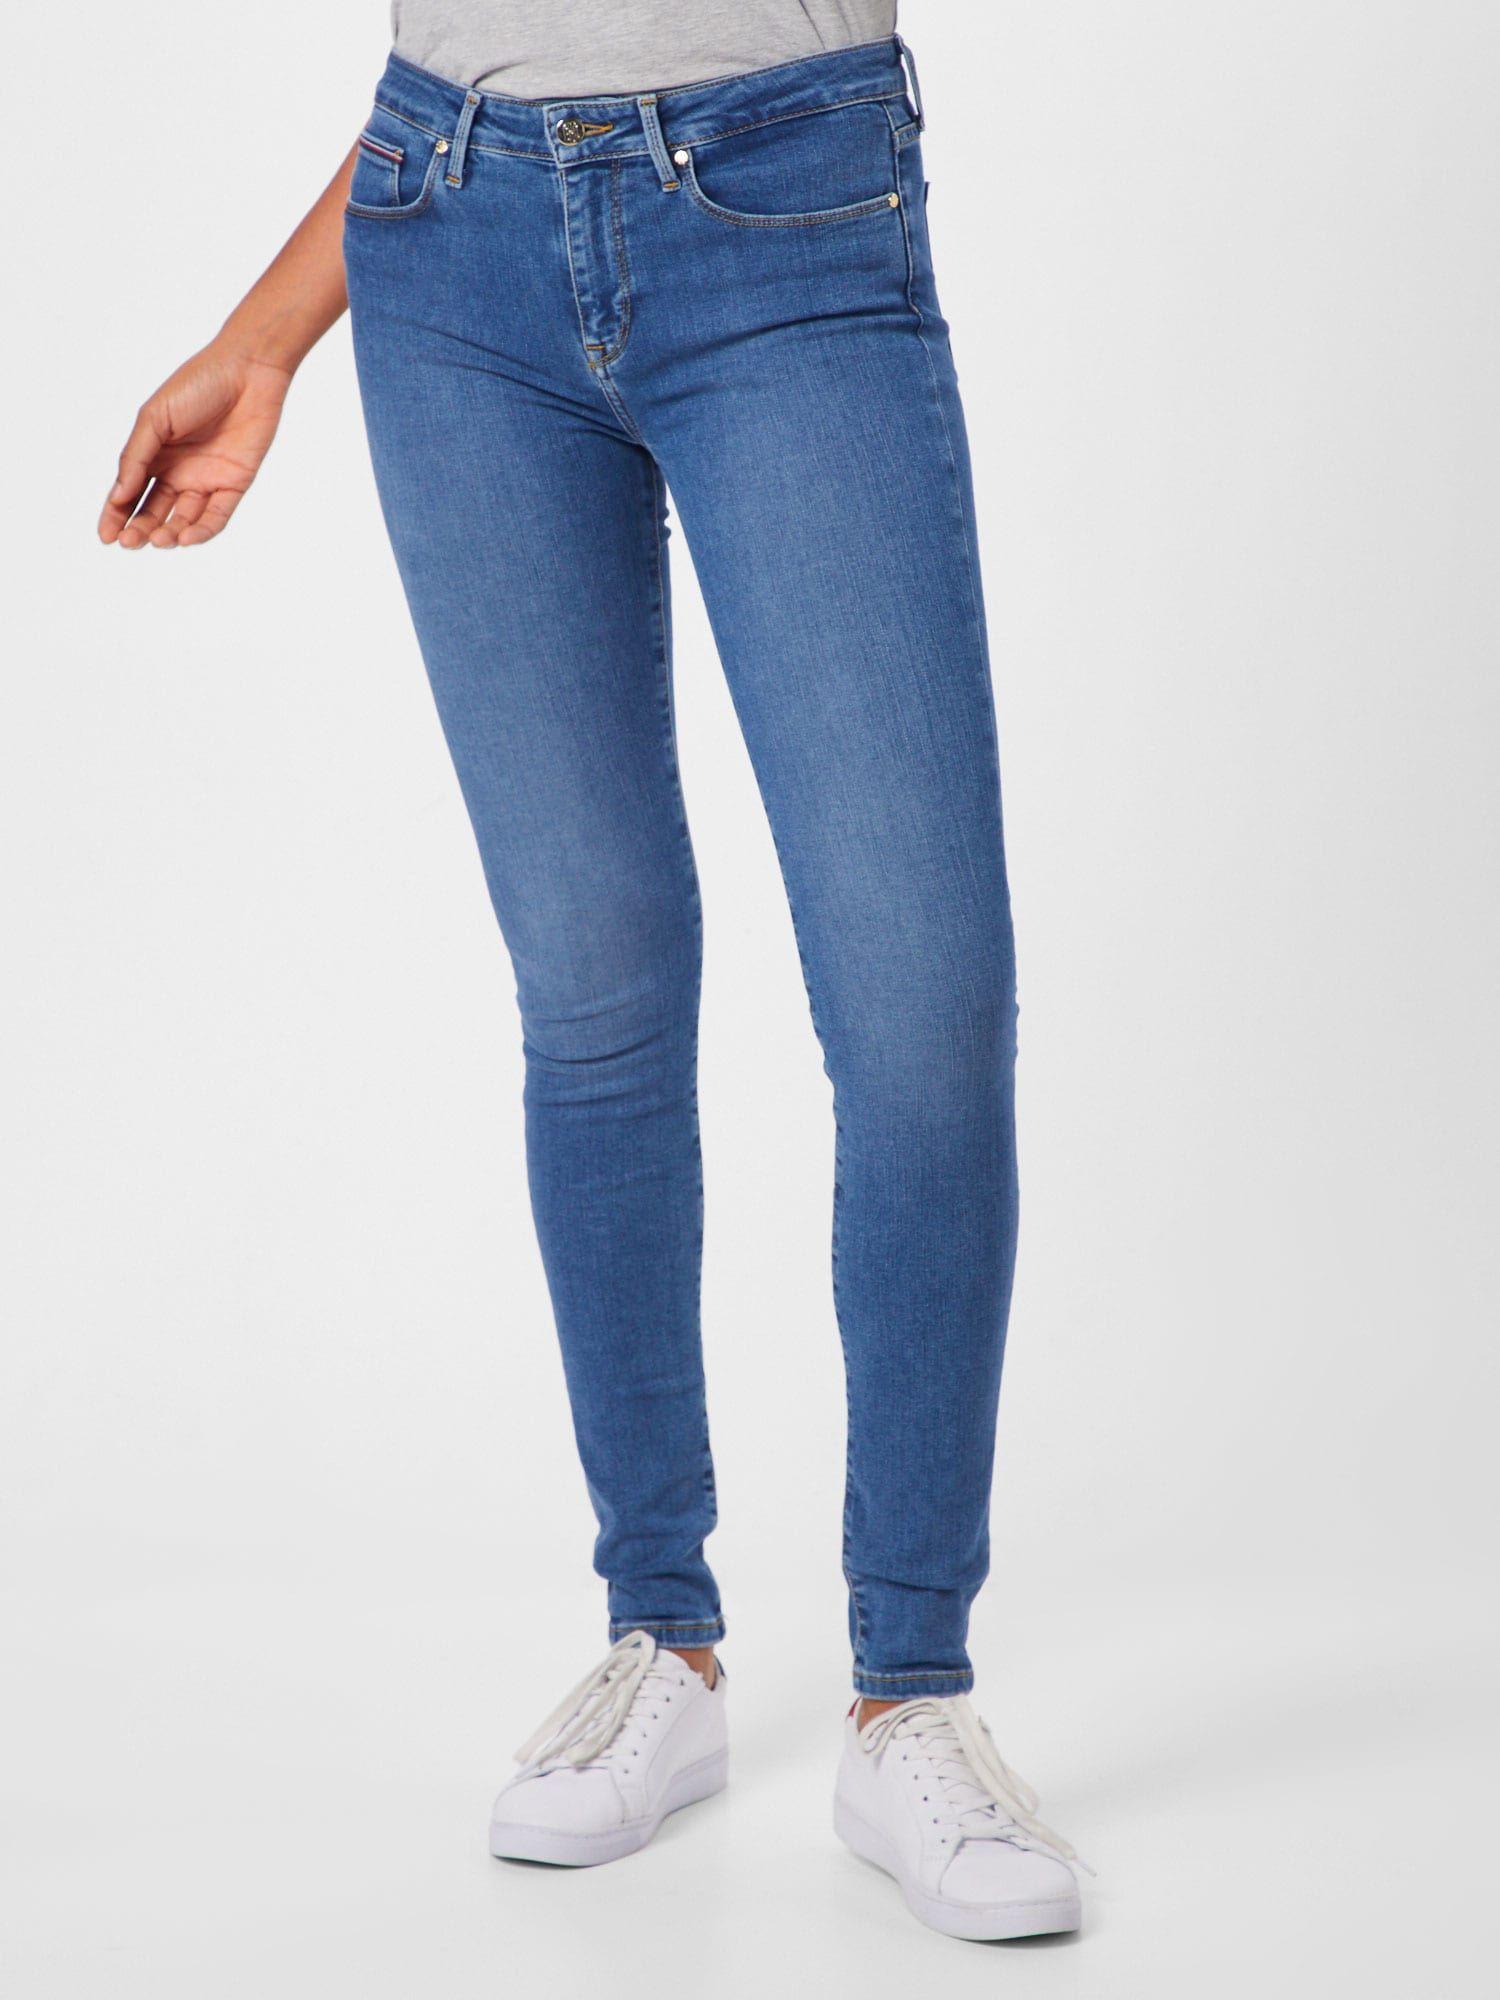 Tommy Hilfiger Jeans Como Skinny Rw Busa Damen Blue Denim